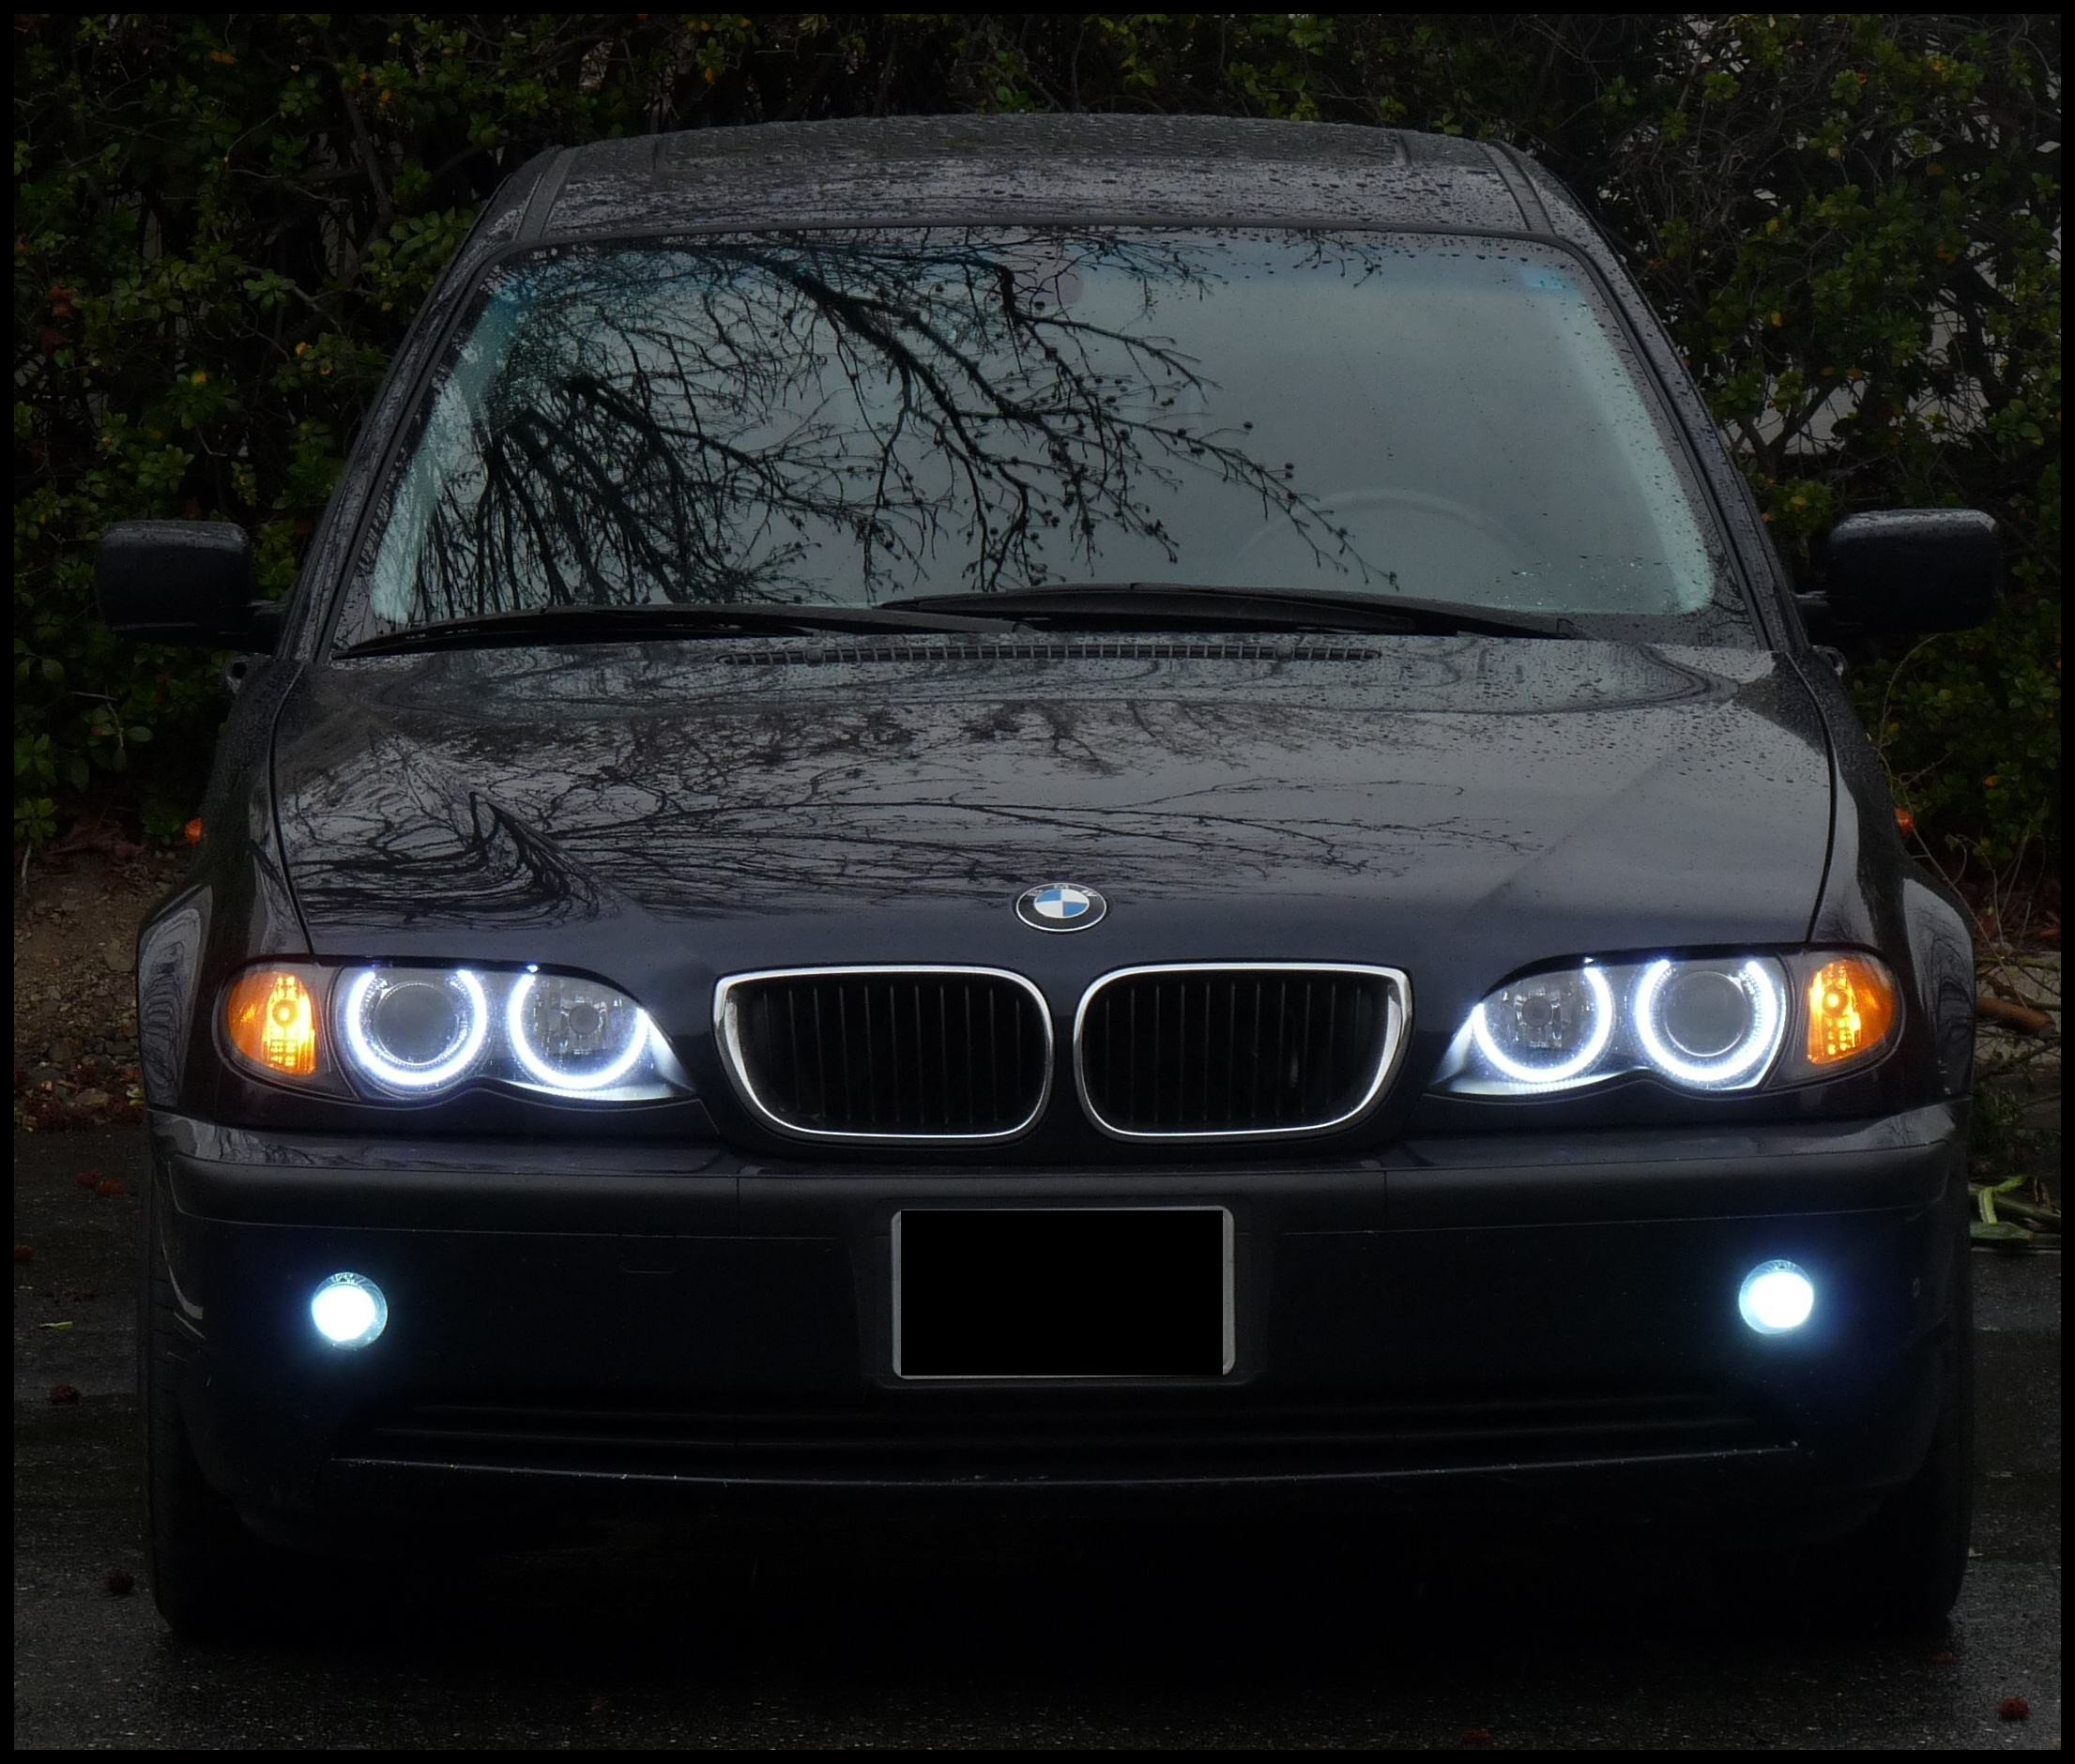 2000 Bmw 528i Headlights orion V2 Led Angel Eyes for Bmw E39 E46 X5 Z3 E36